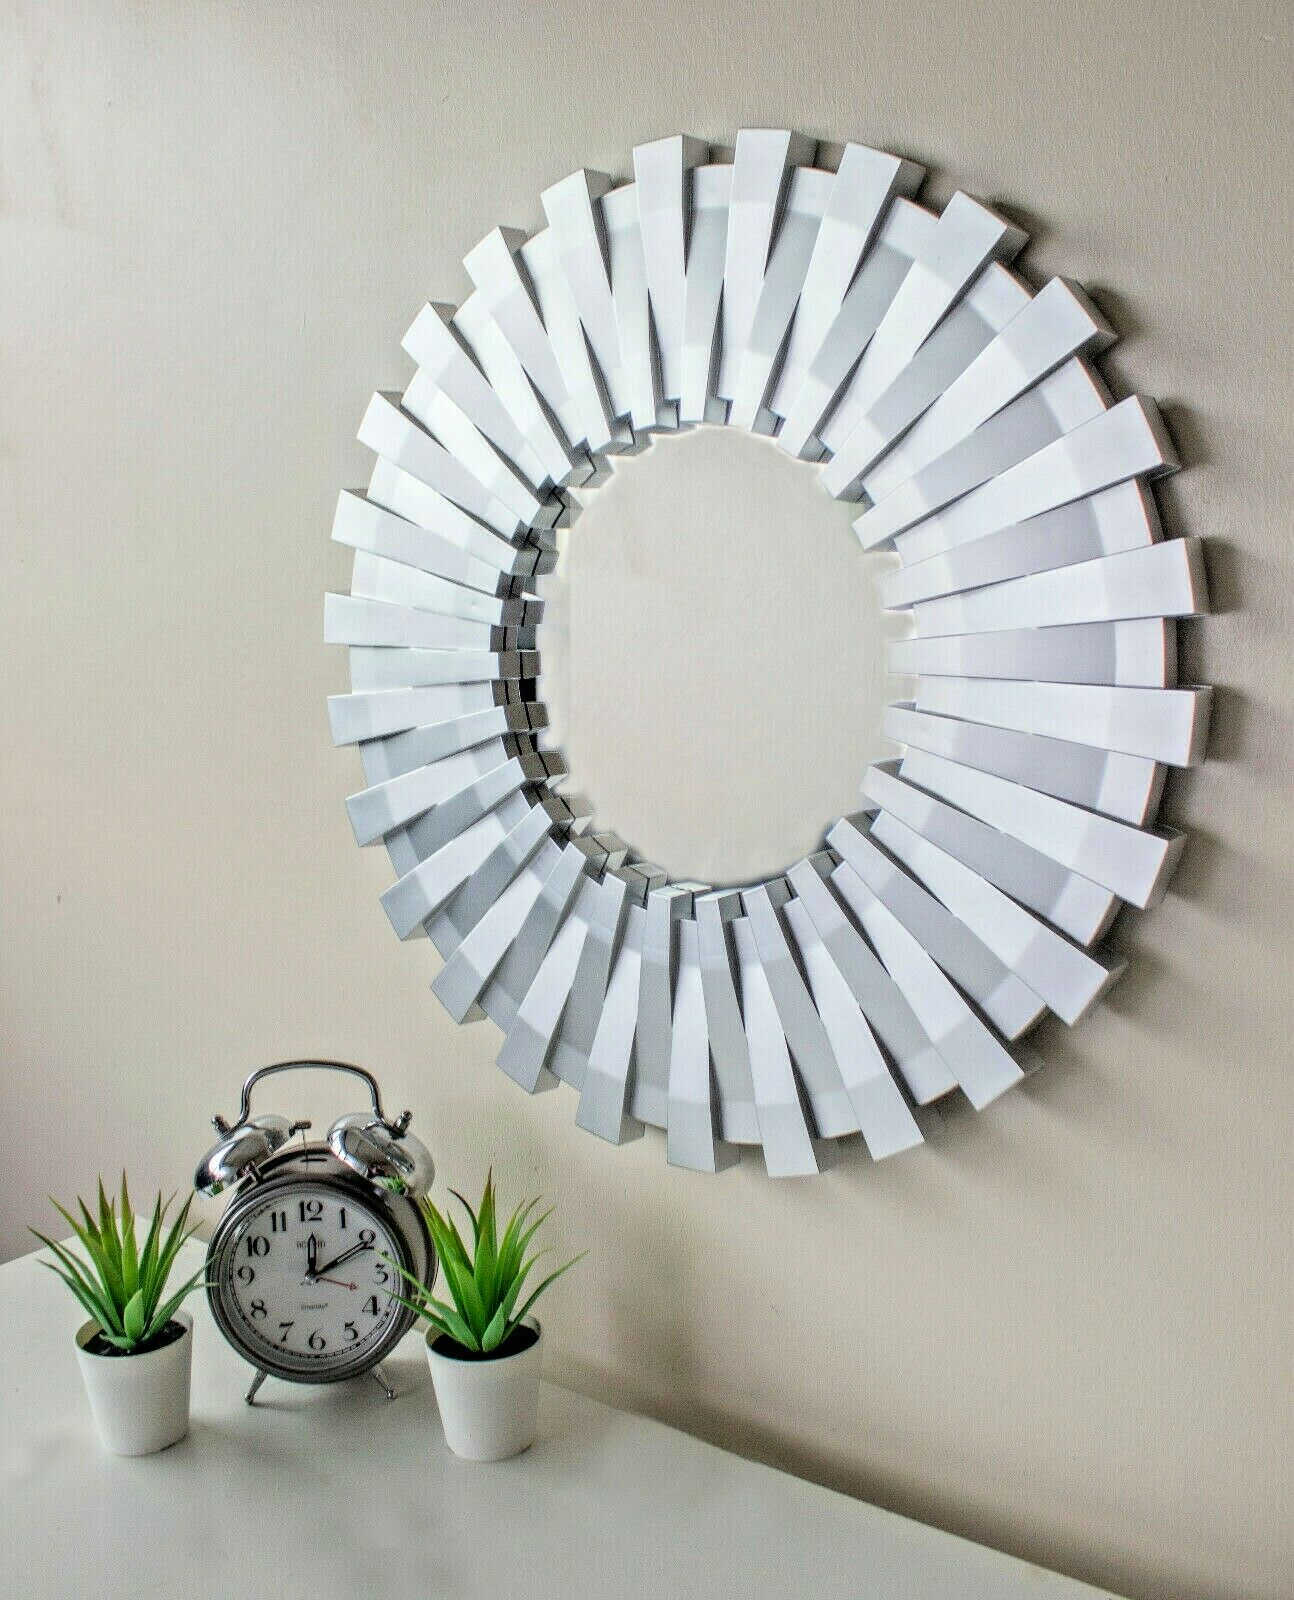 mirror - 50cm Sunburst Wall Mounted Silver Mirror Large Home Decor Round Modern Vanity